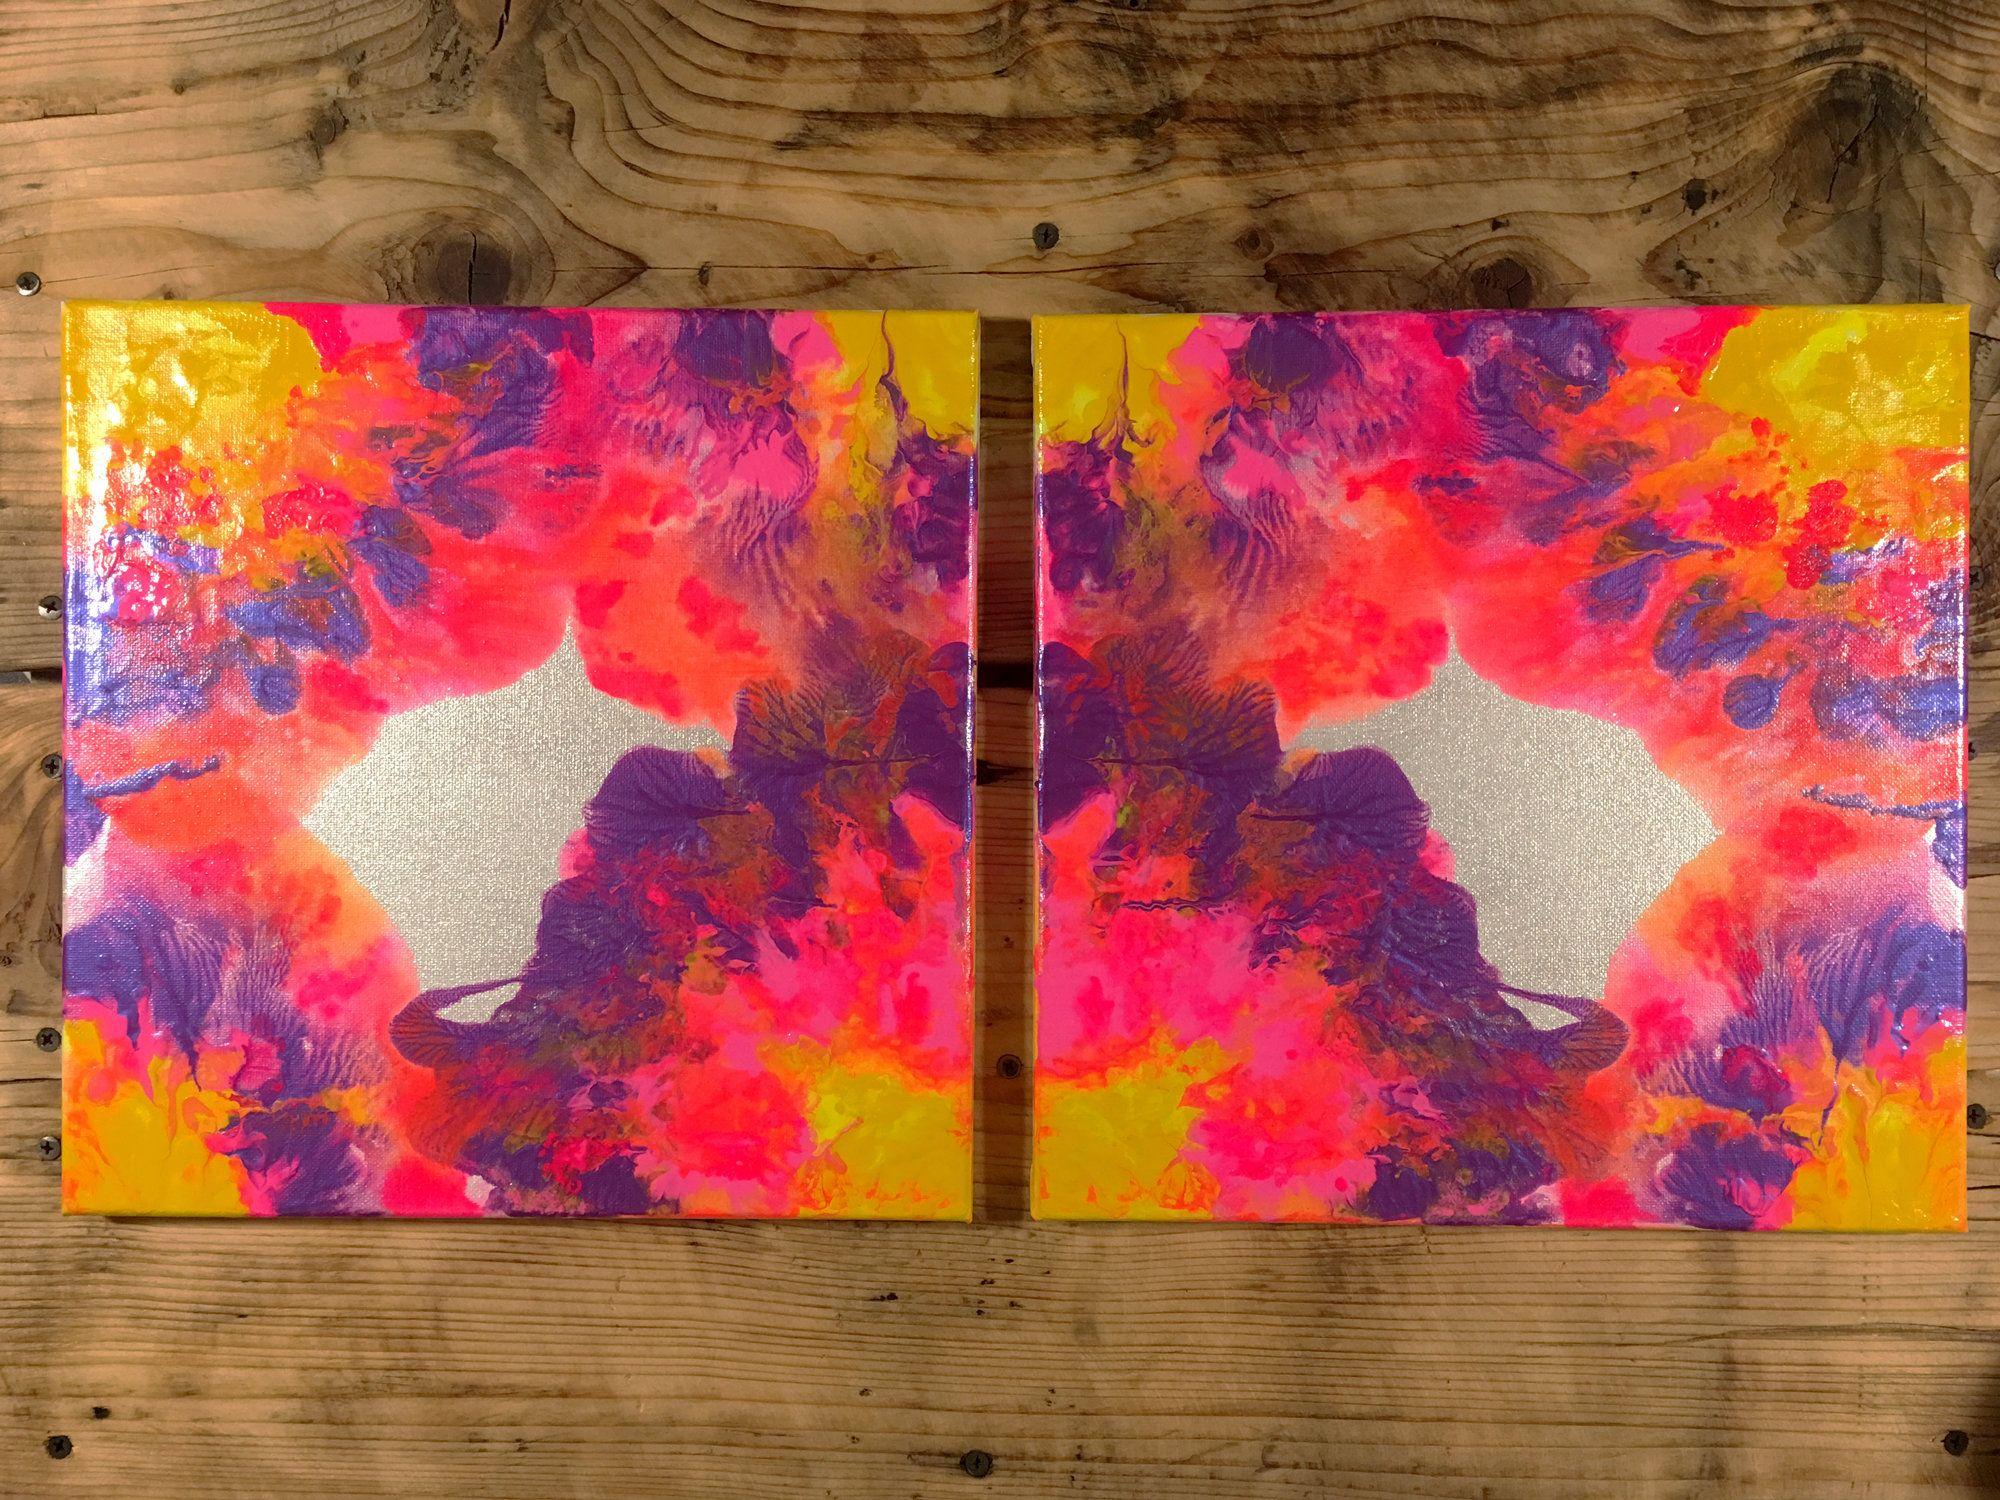 Abstract Painting Set Of 2 Bright Abstract Wall Art Etsy Rainbow Abstract Painting Etsy Wall Art Rainbow Abstract Art